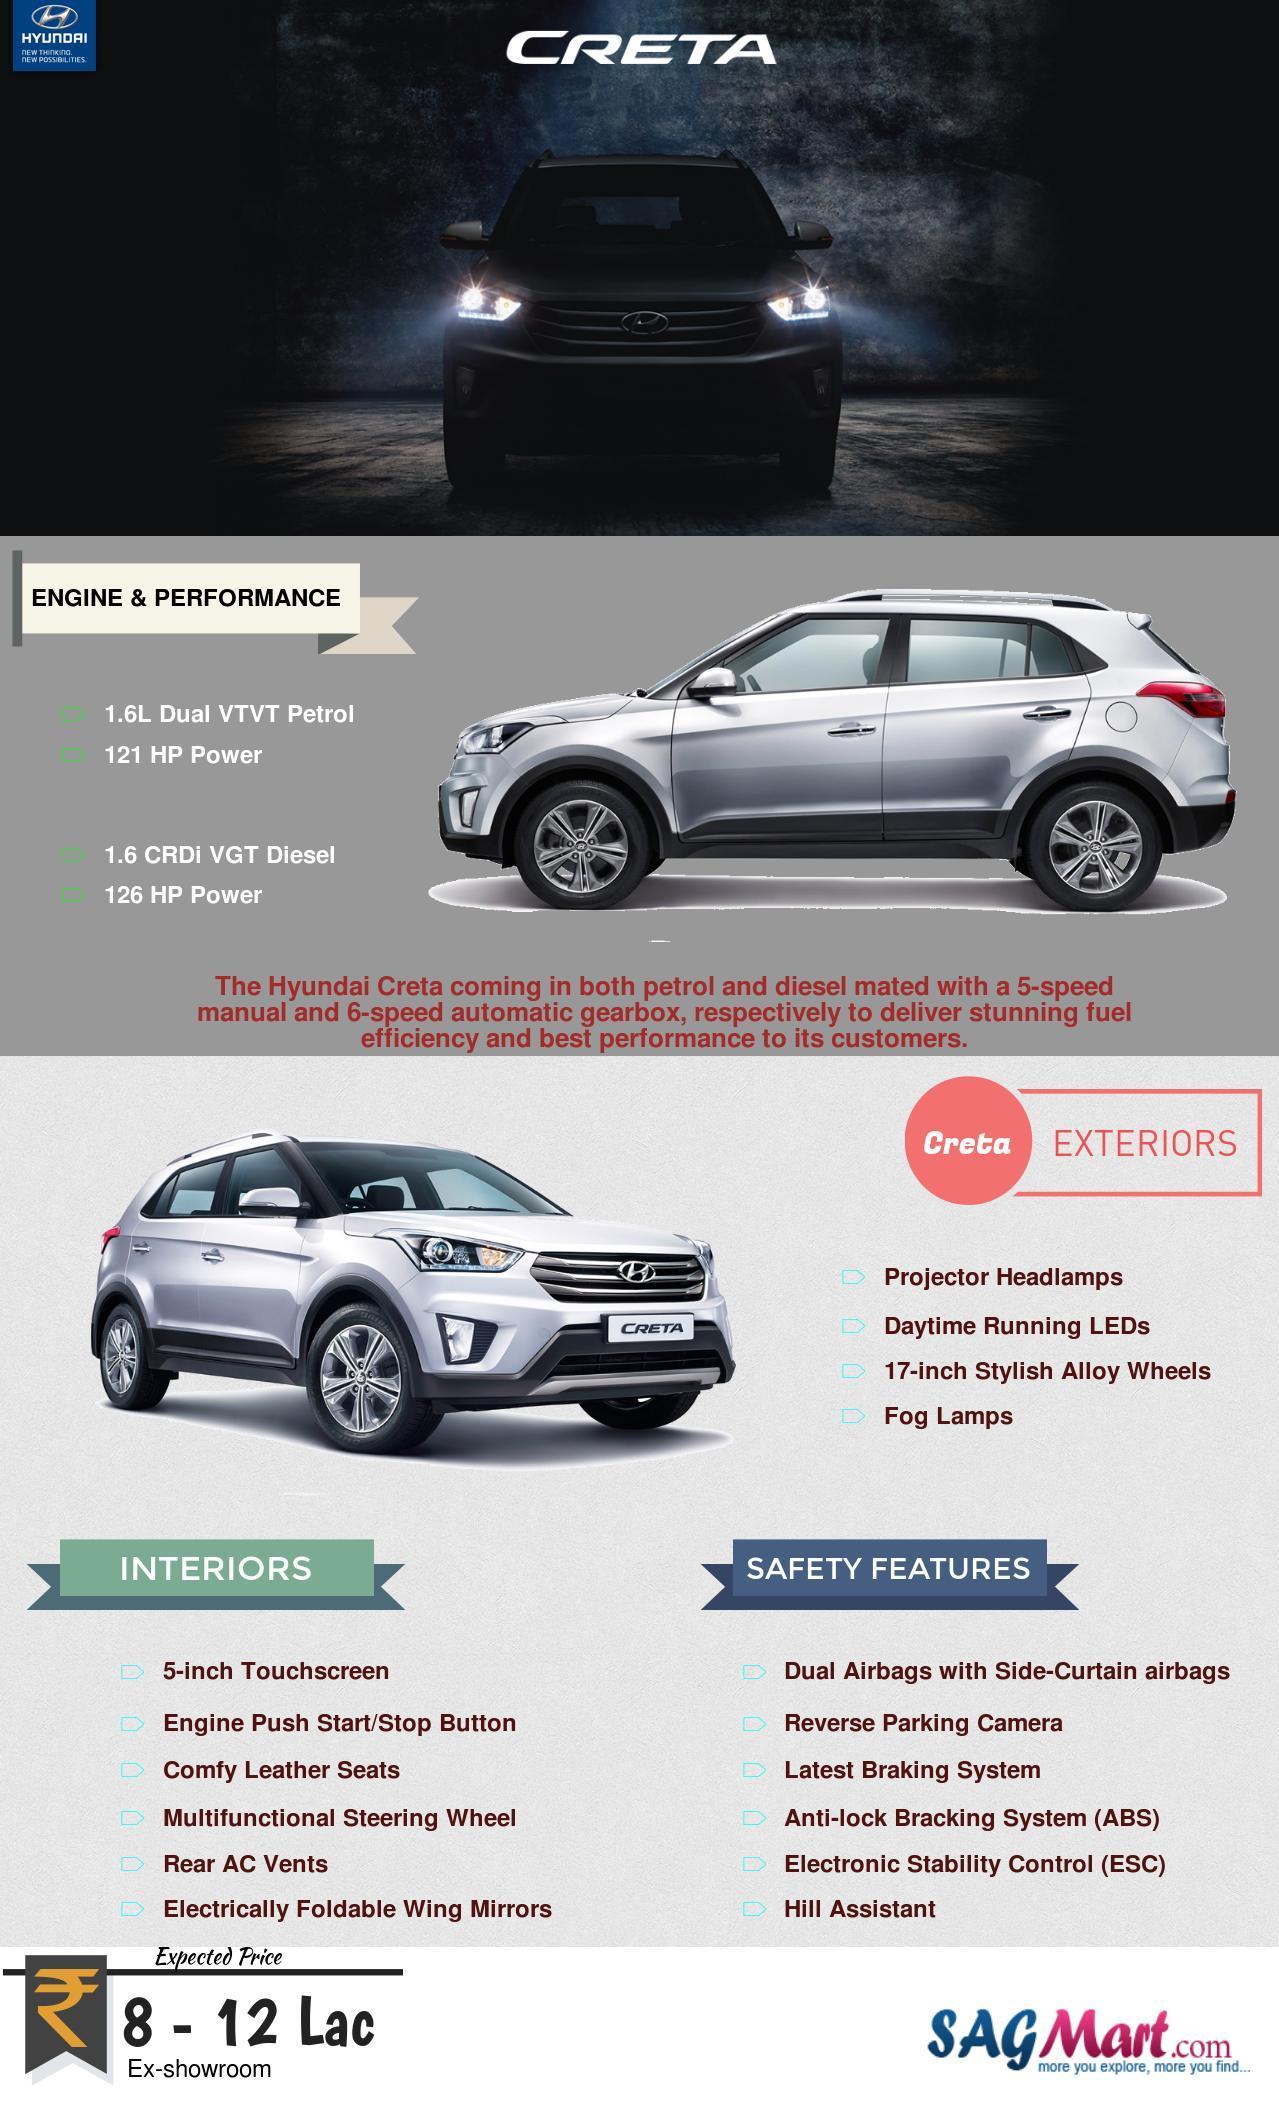 Hyundai Creta Infographic